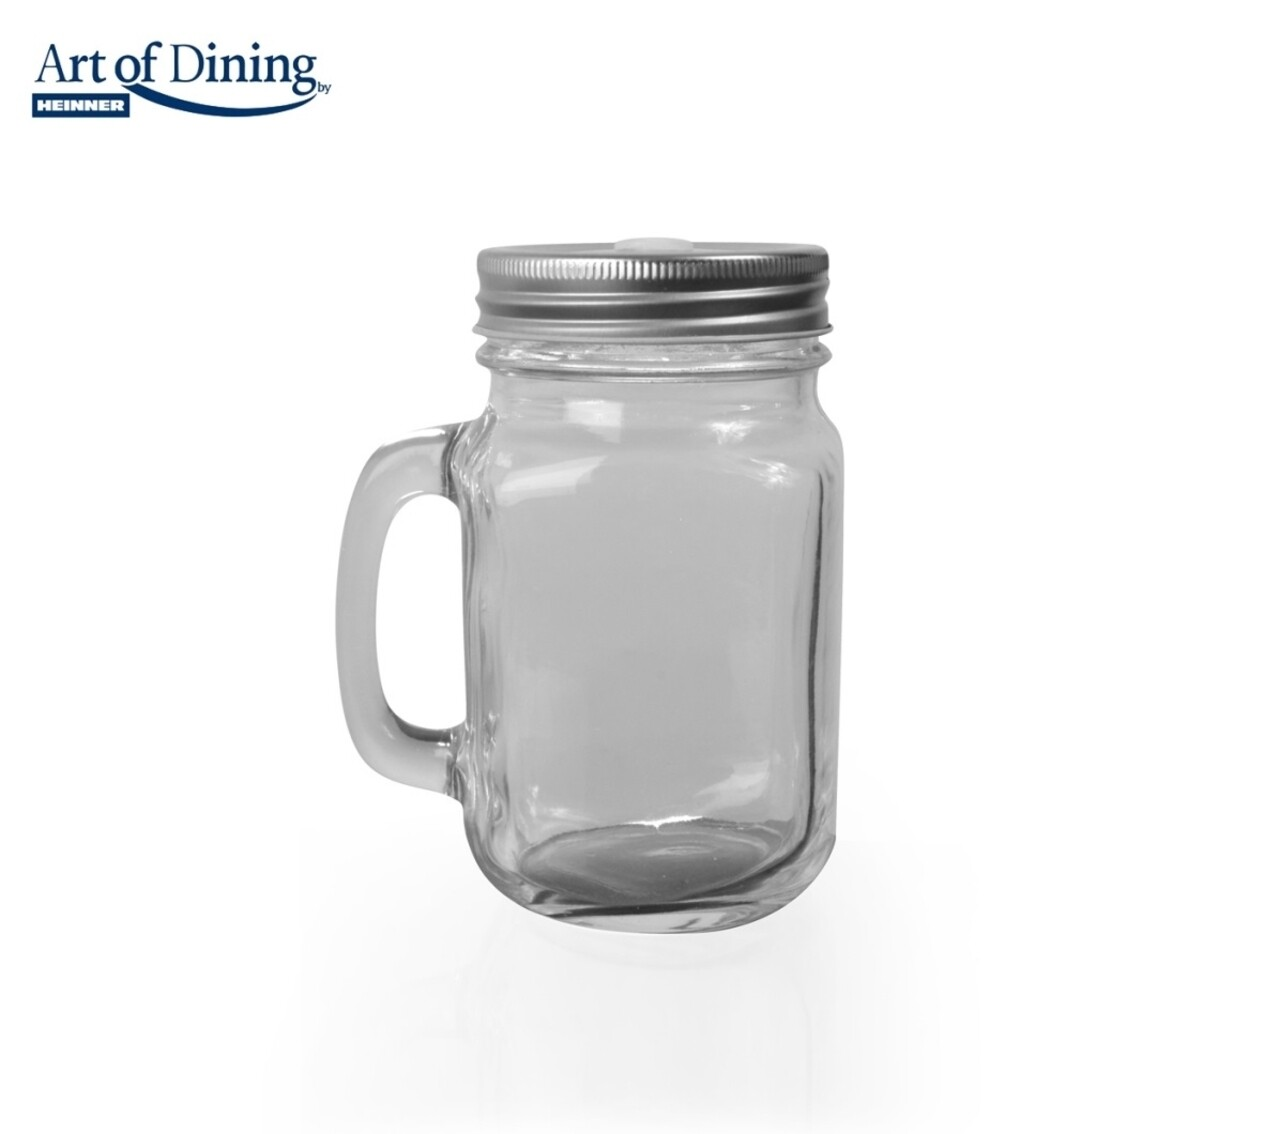 Halba tip borcan cu capac perforat, Heinner Home, 600 ml, sticla/metal, transparent